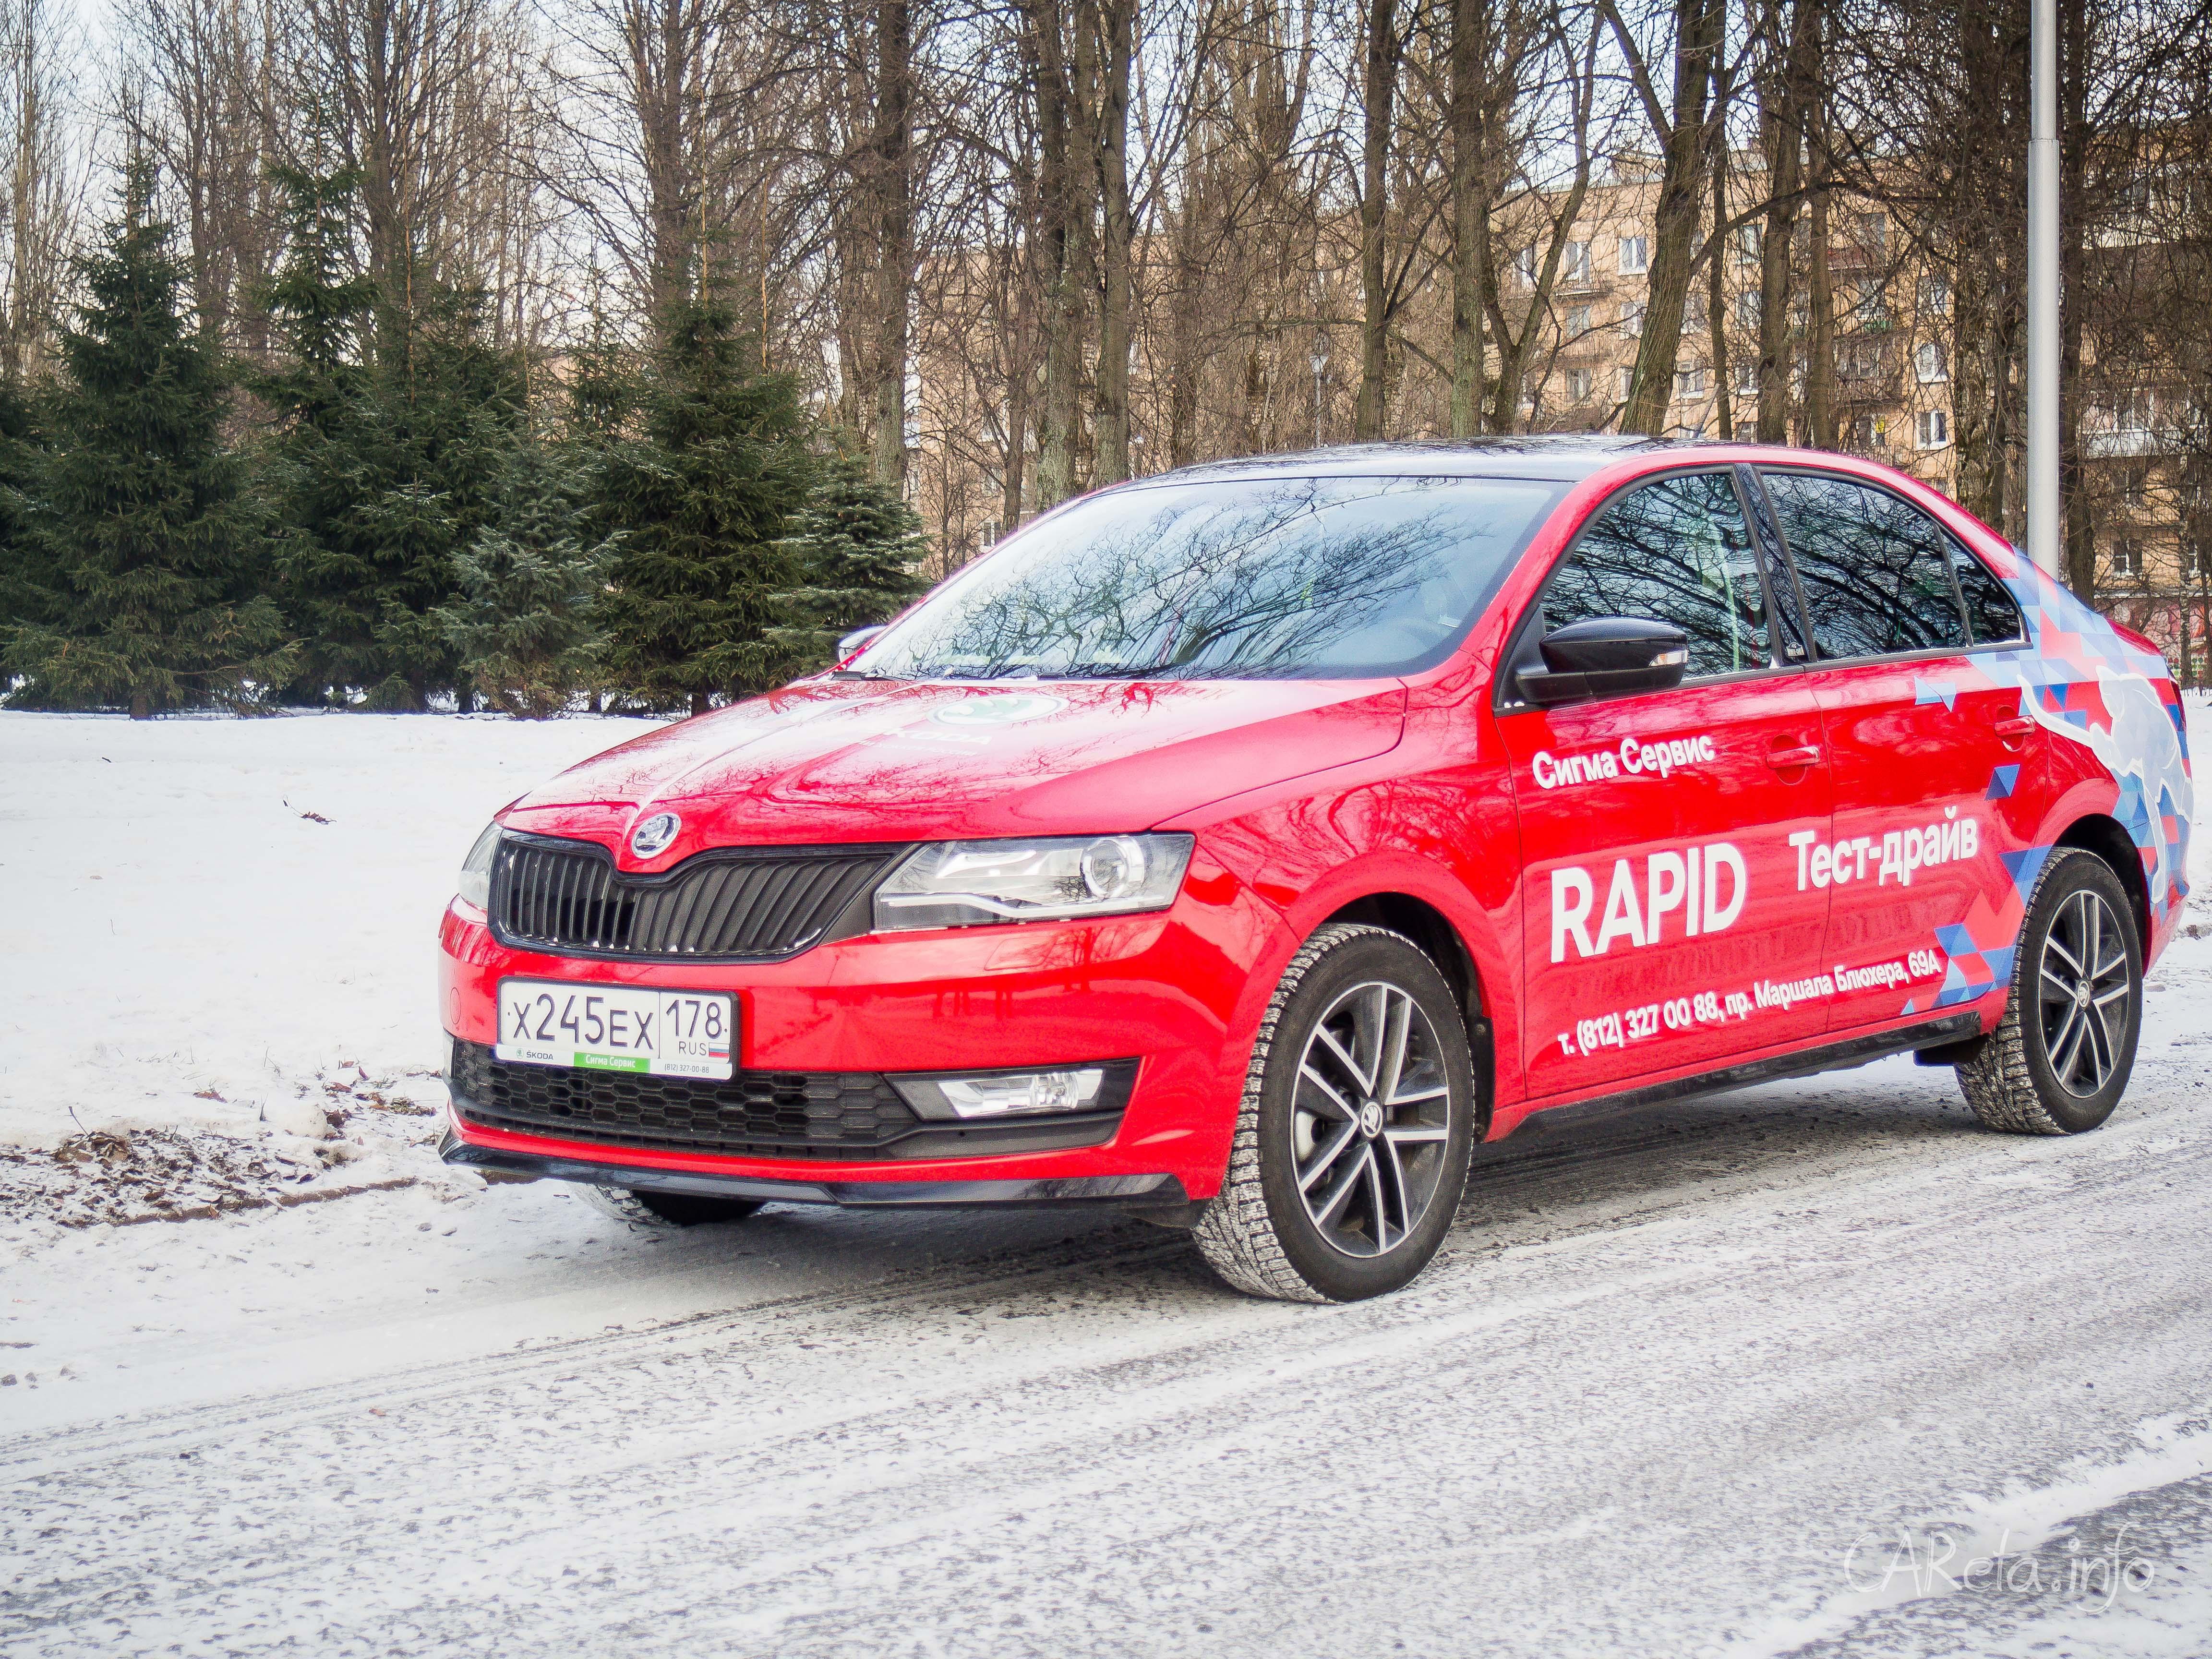 Блиц-обзор Skoda Rapid Monte Carlo